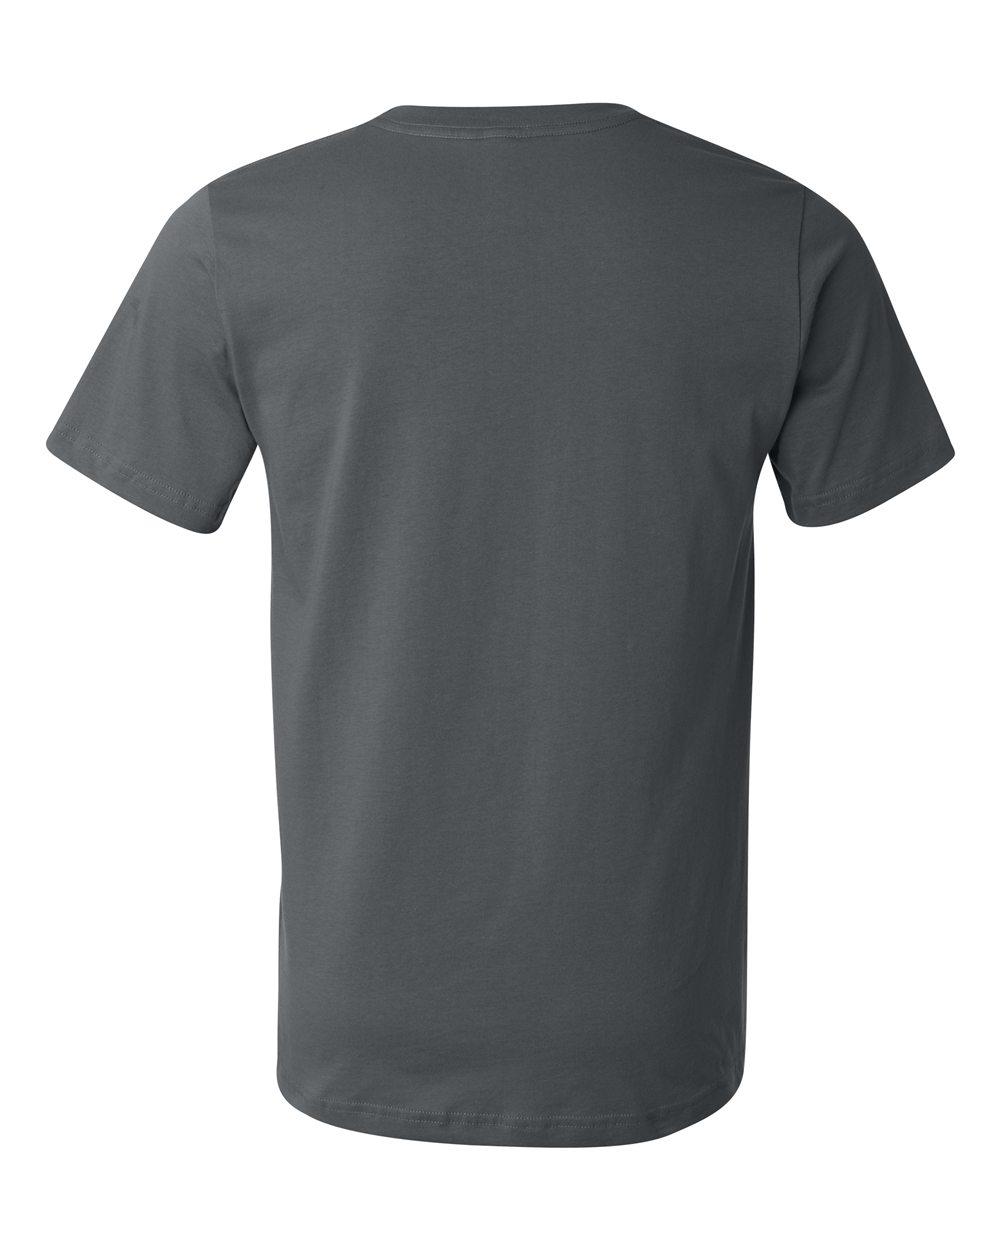 Bella-Canvas-Unisex-Made-in-USA-Jersey-Short-Sleeve-T-Shirt-3001U-XS-3XL thumbnail 4